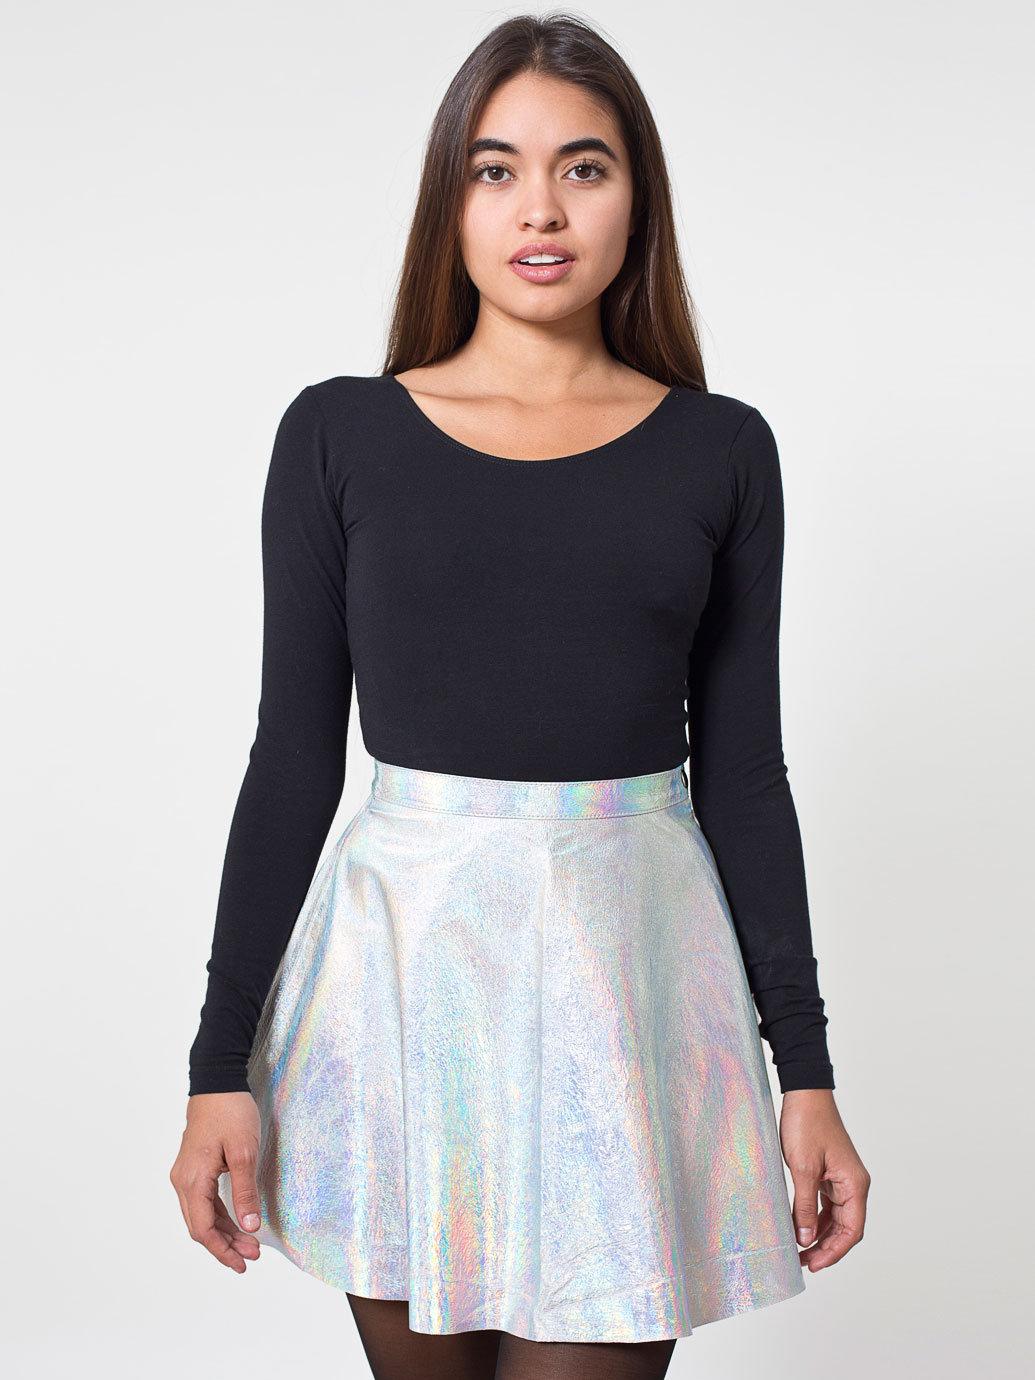 Hologram leather circle skirt